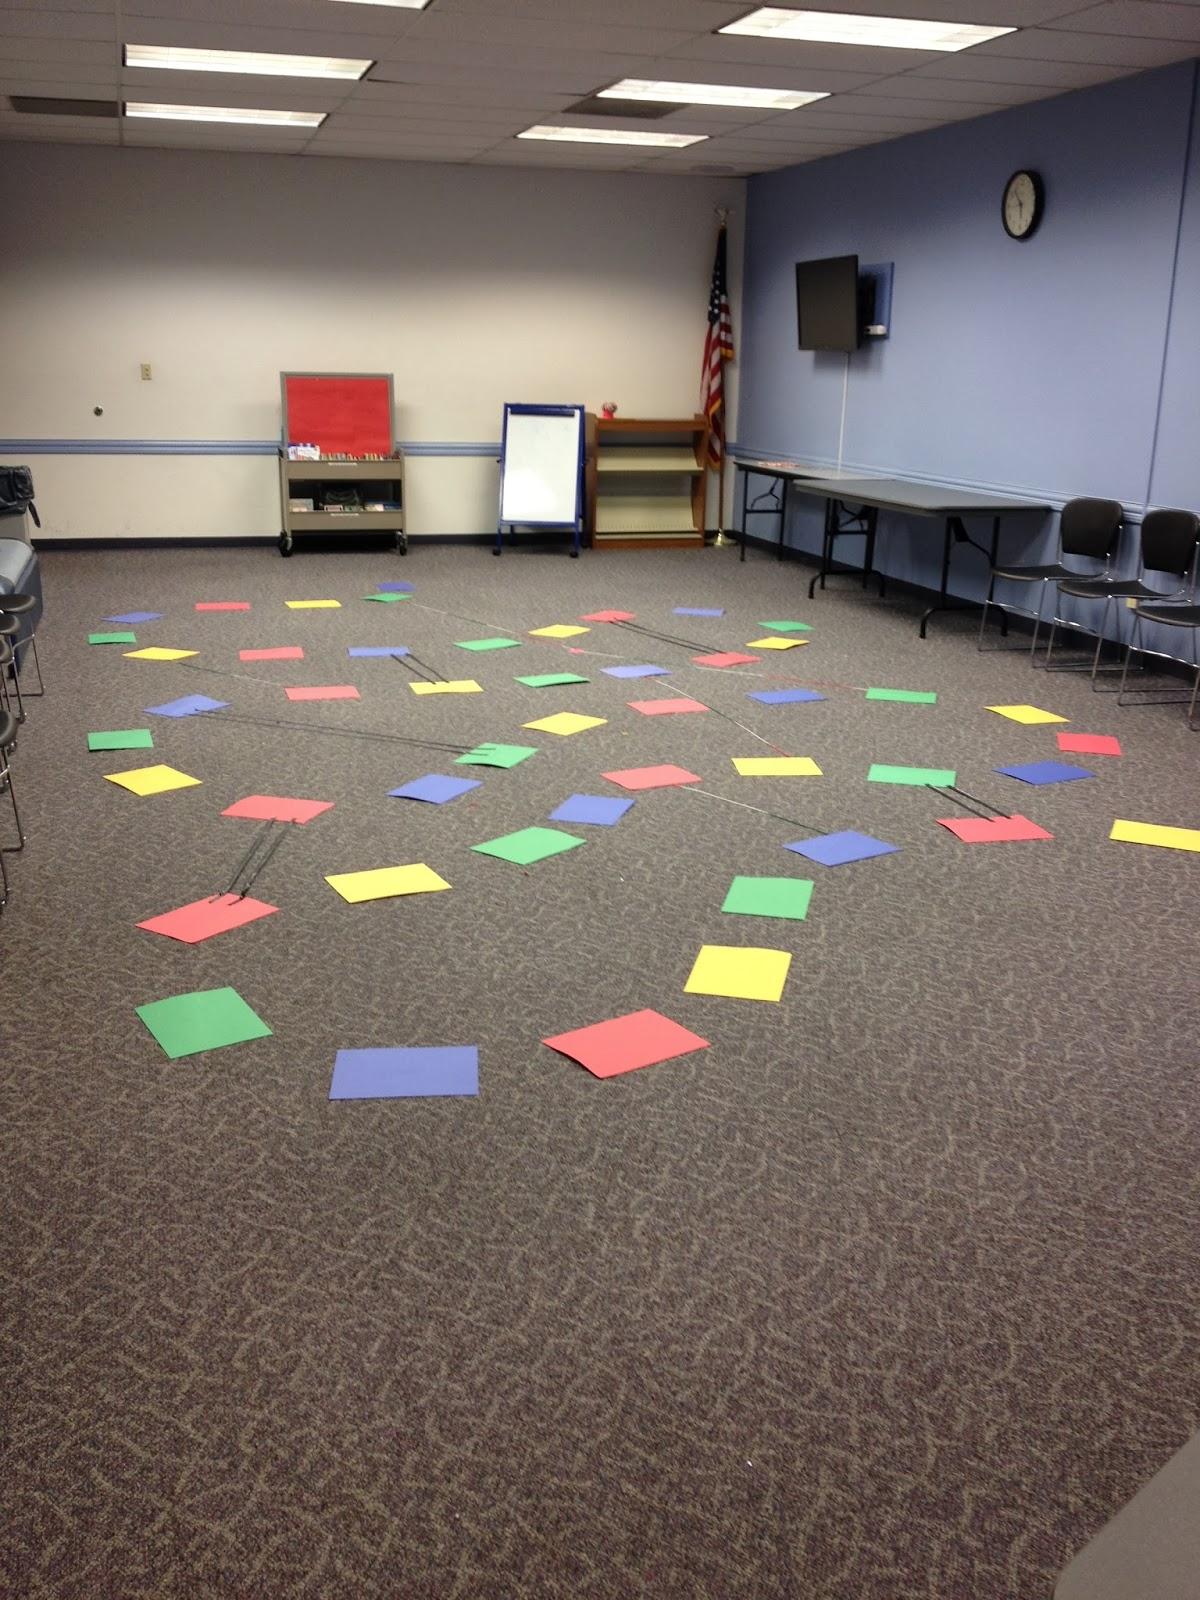 Meeting Room Planning Template